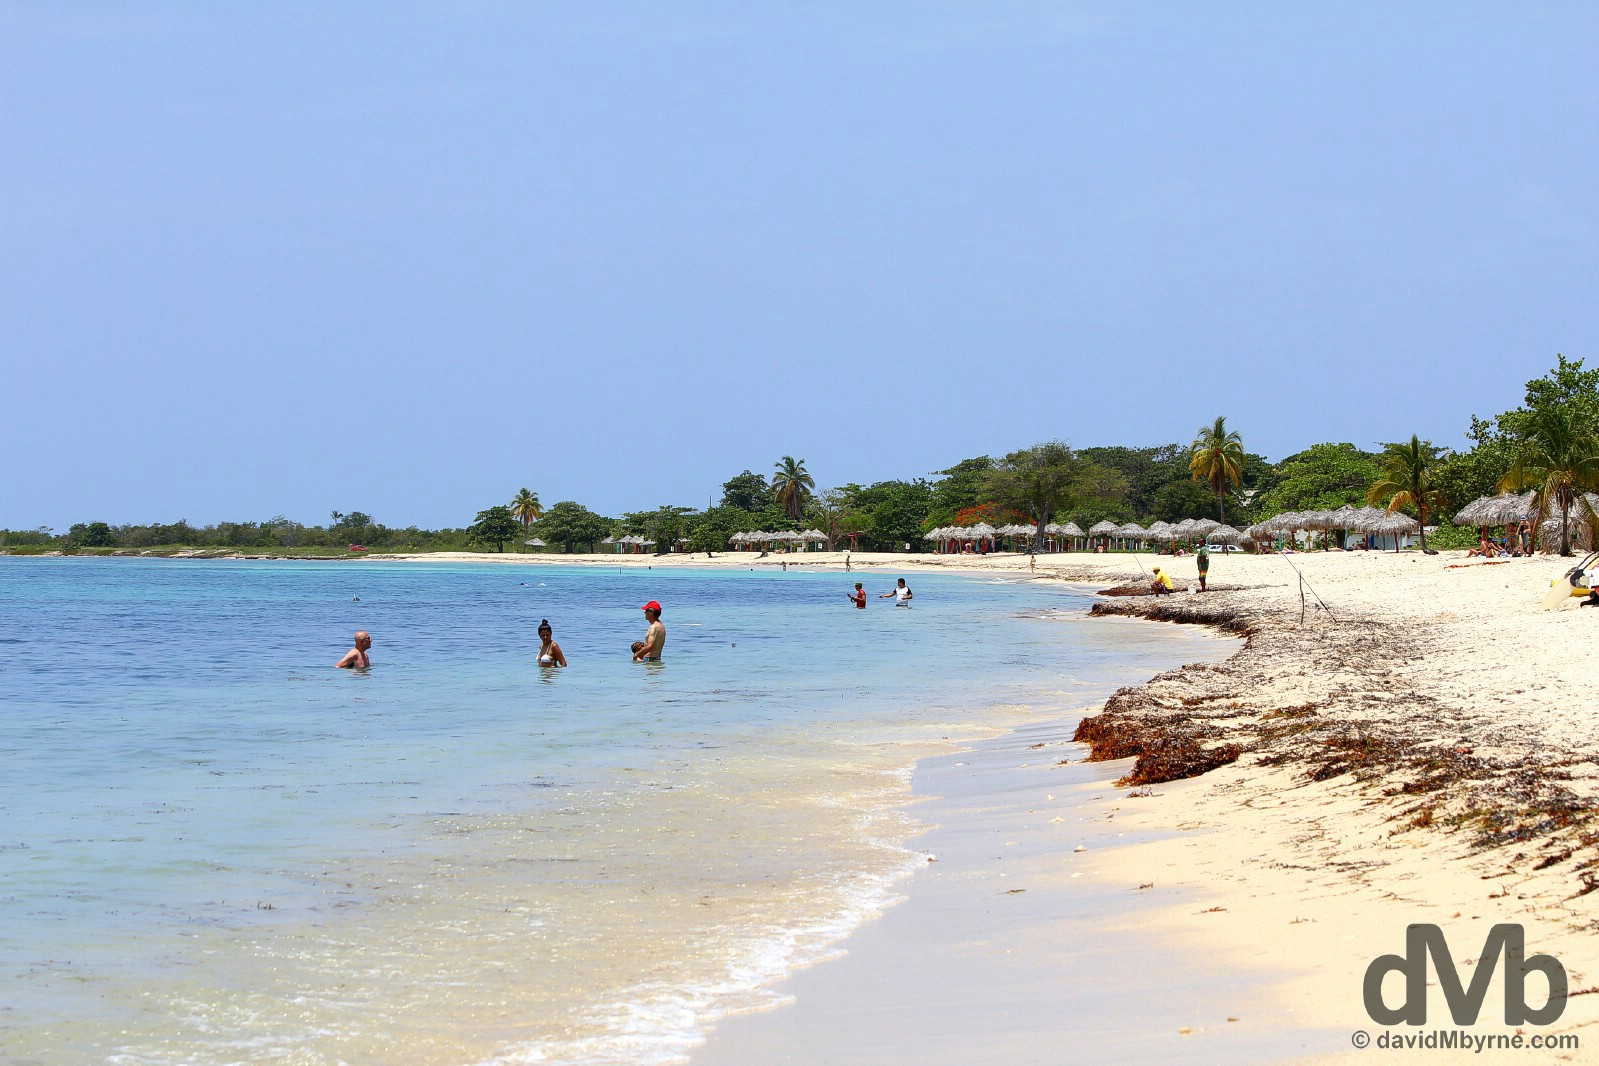 Playa Ancon, Cuba. May 6, 2015.